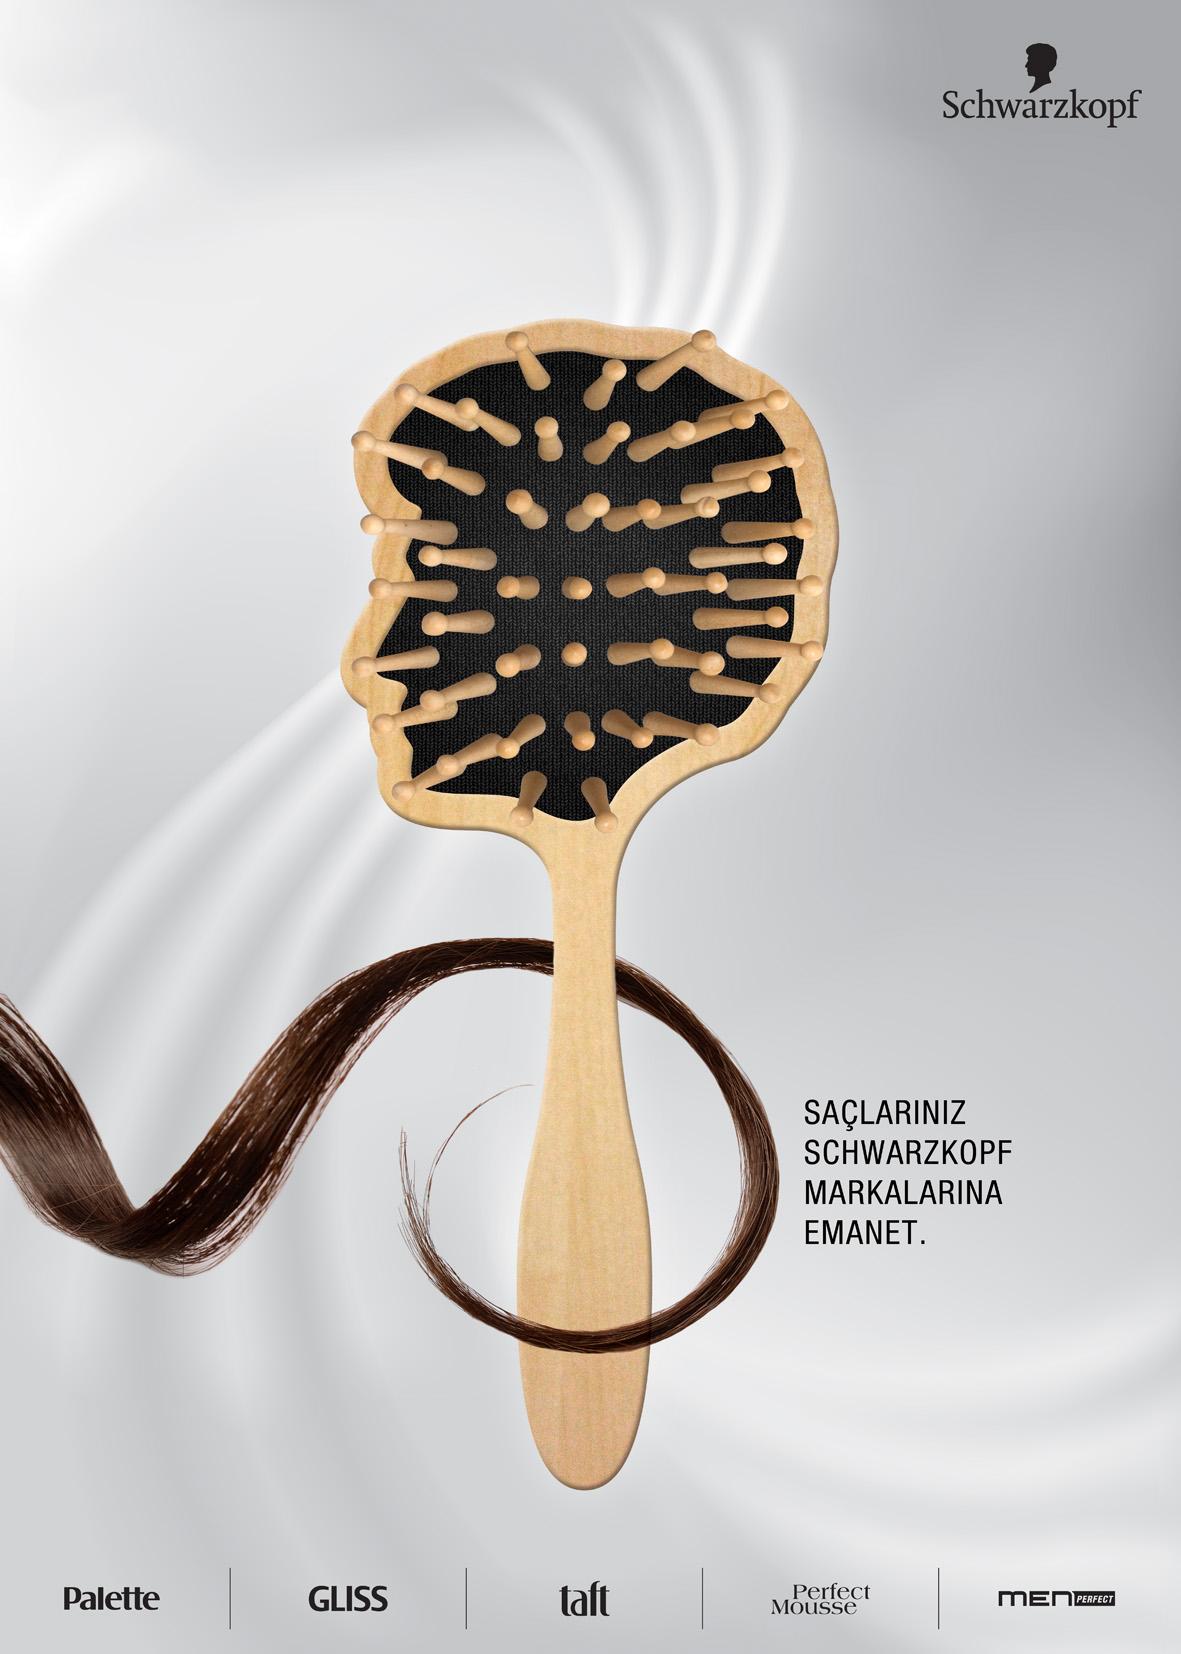 Sch-image-Dsg-Brush-SERDAL.jpg